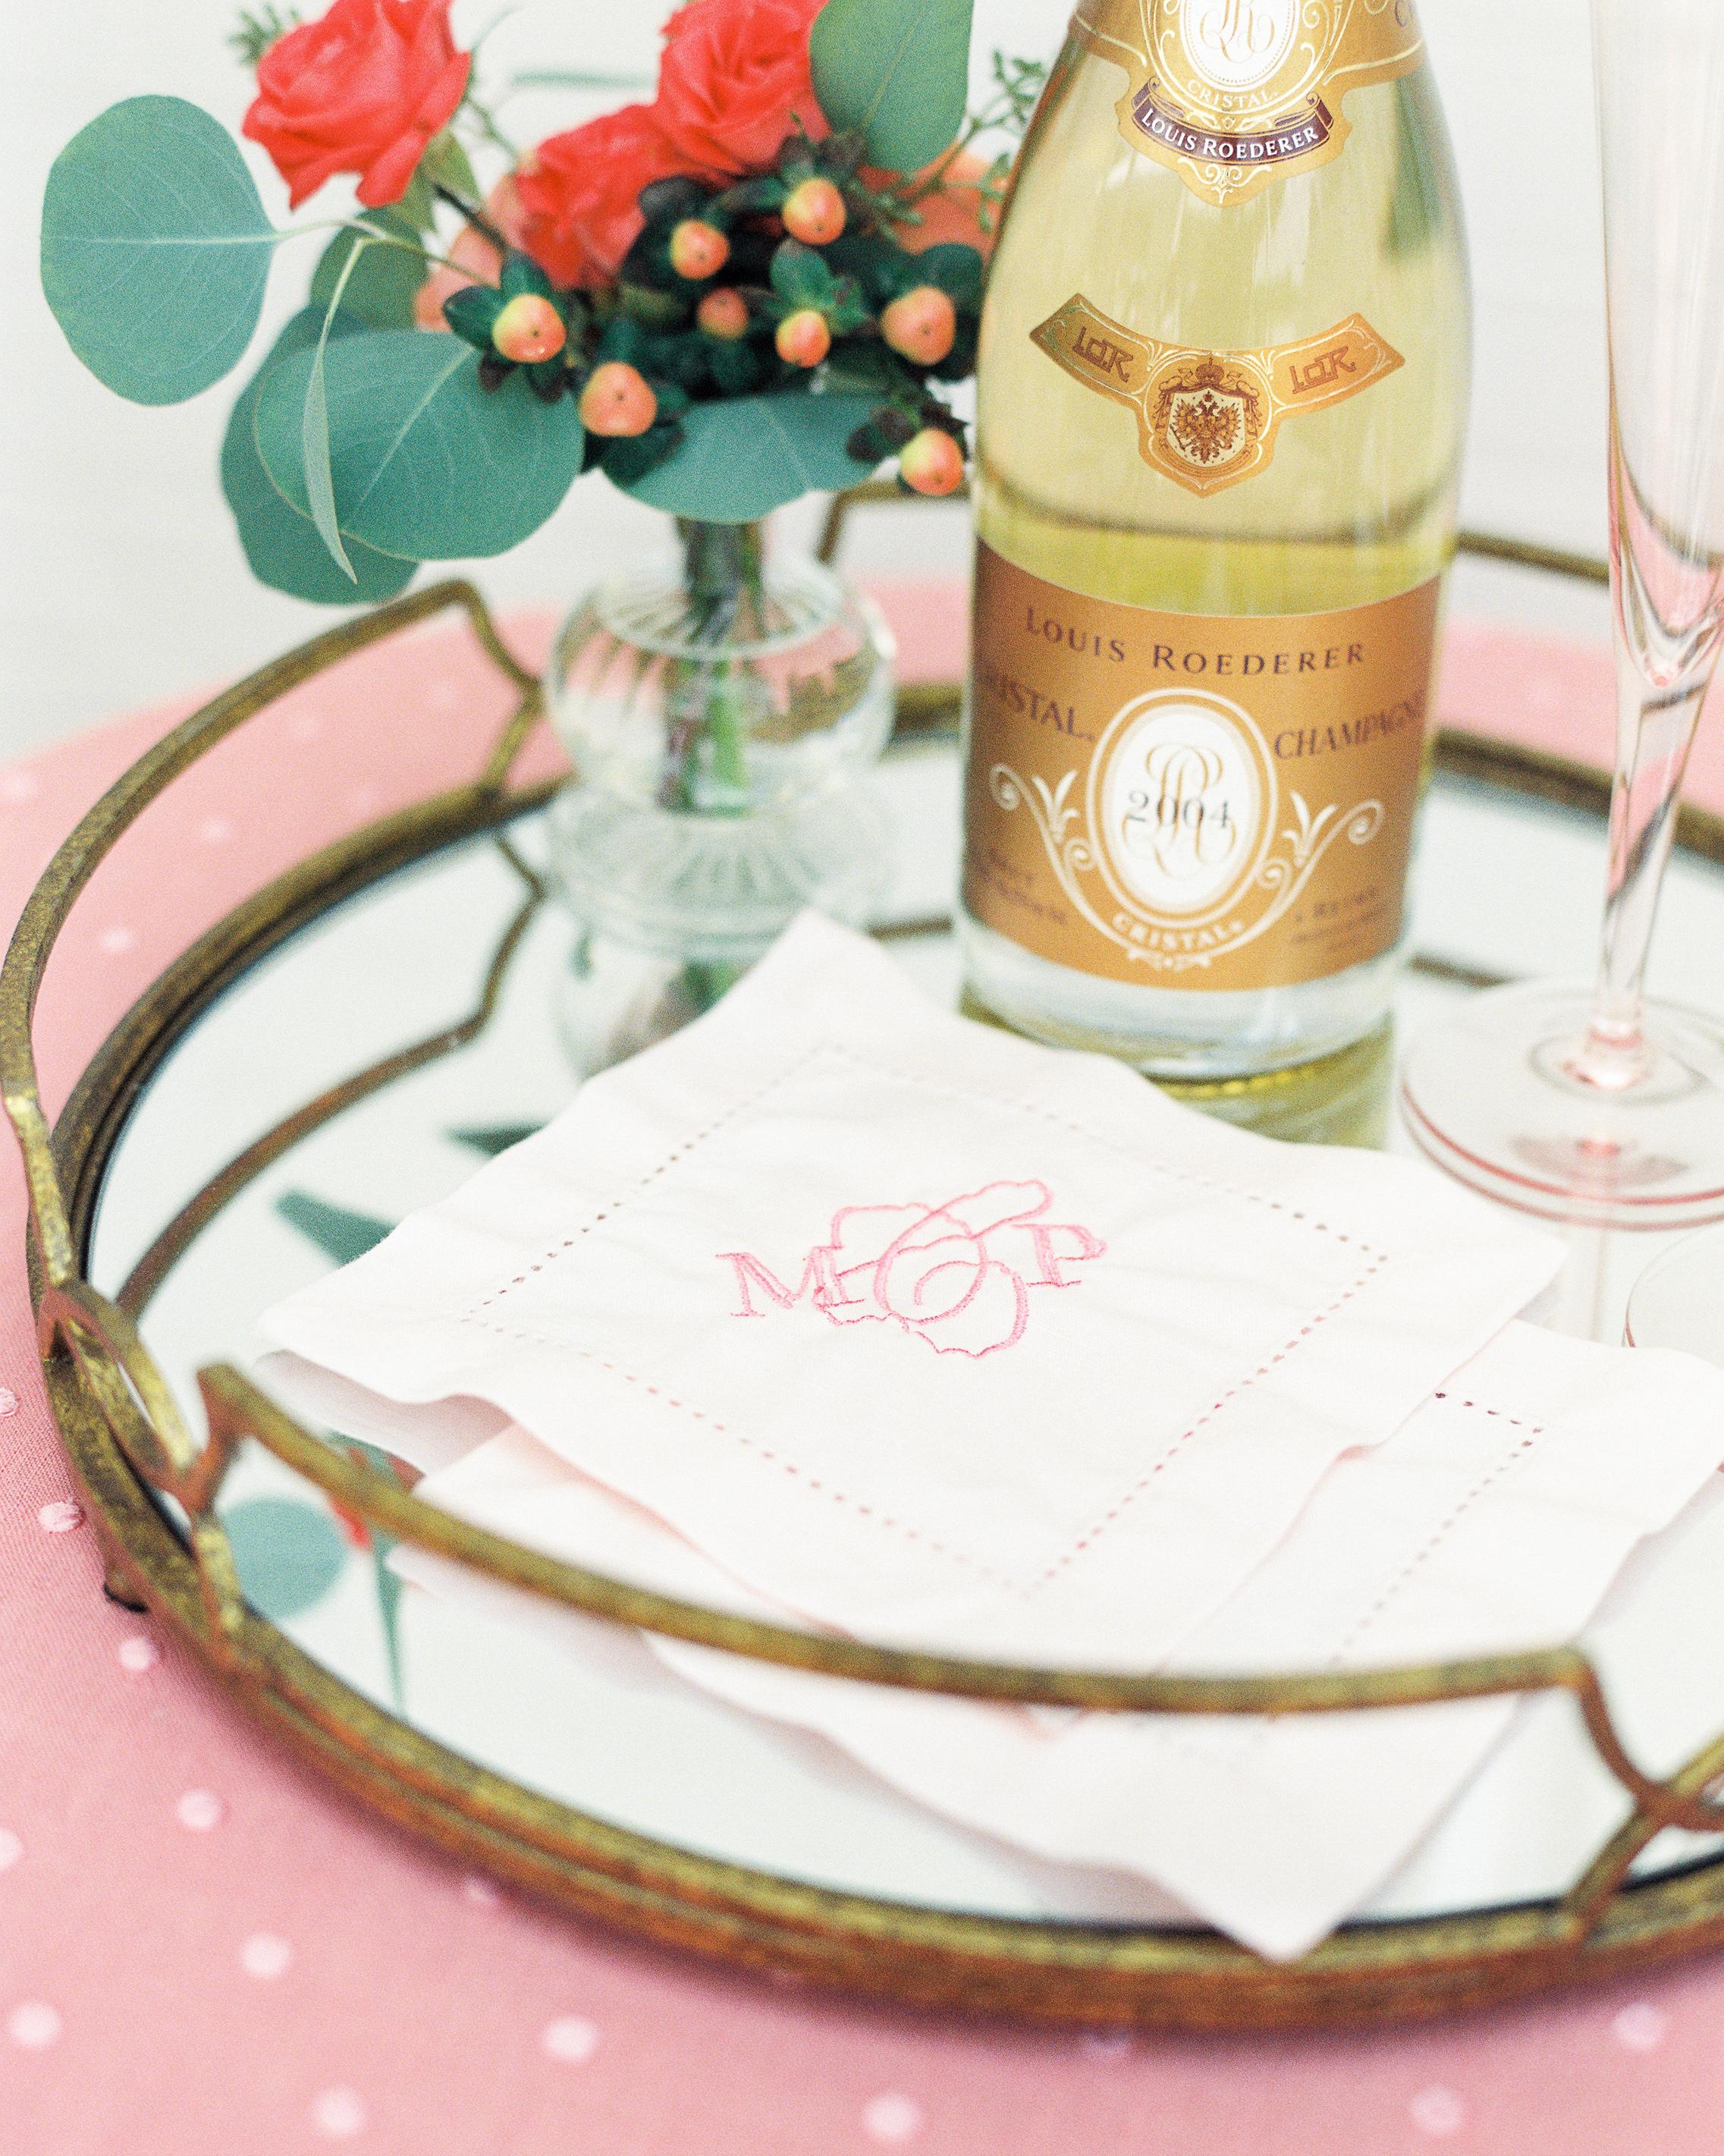 molly-patrick-wedding-champagne-3034-s111760-0115.jpg